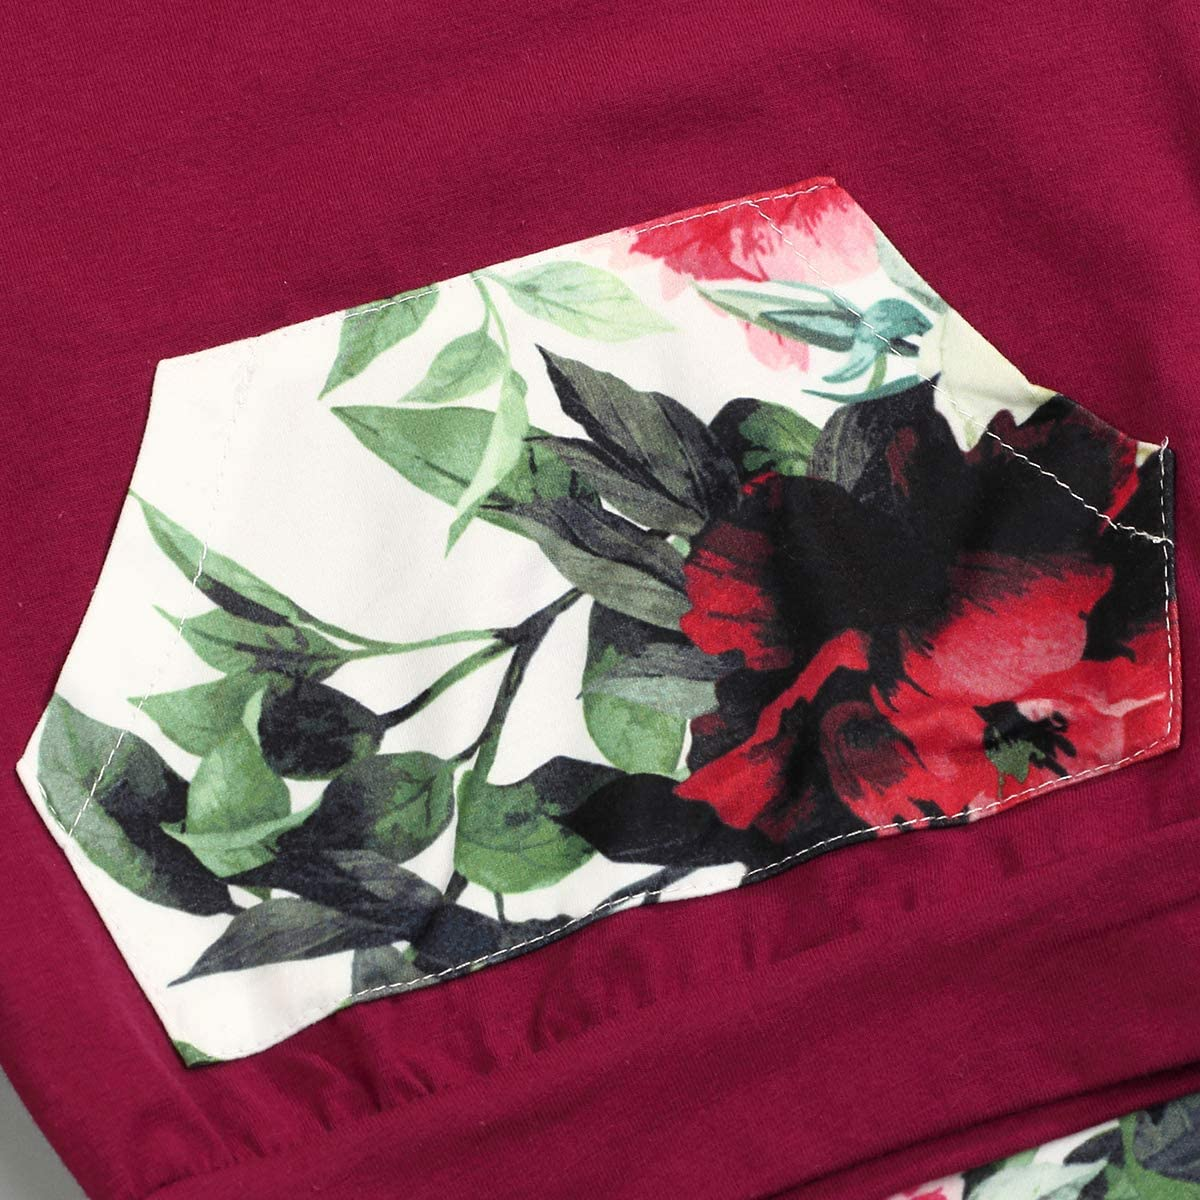 Hosen Outfit Set 2PC Baby M/ädchen Floral Bedruckte Kleidung Set Infant Hoodies Pocket Top